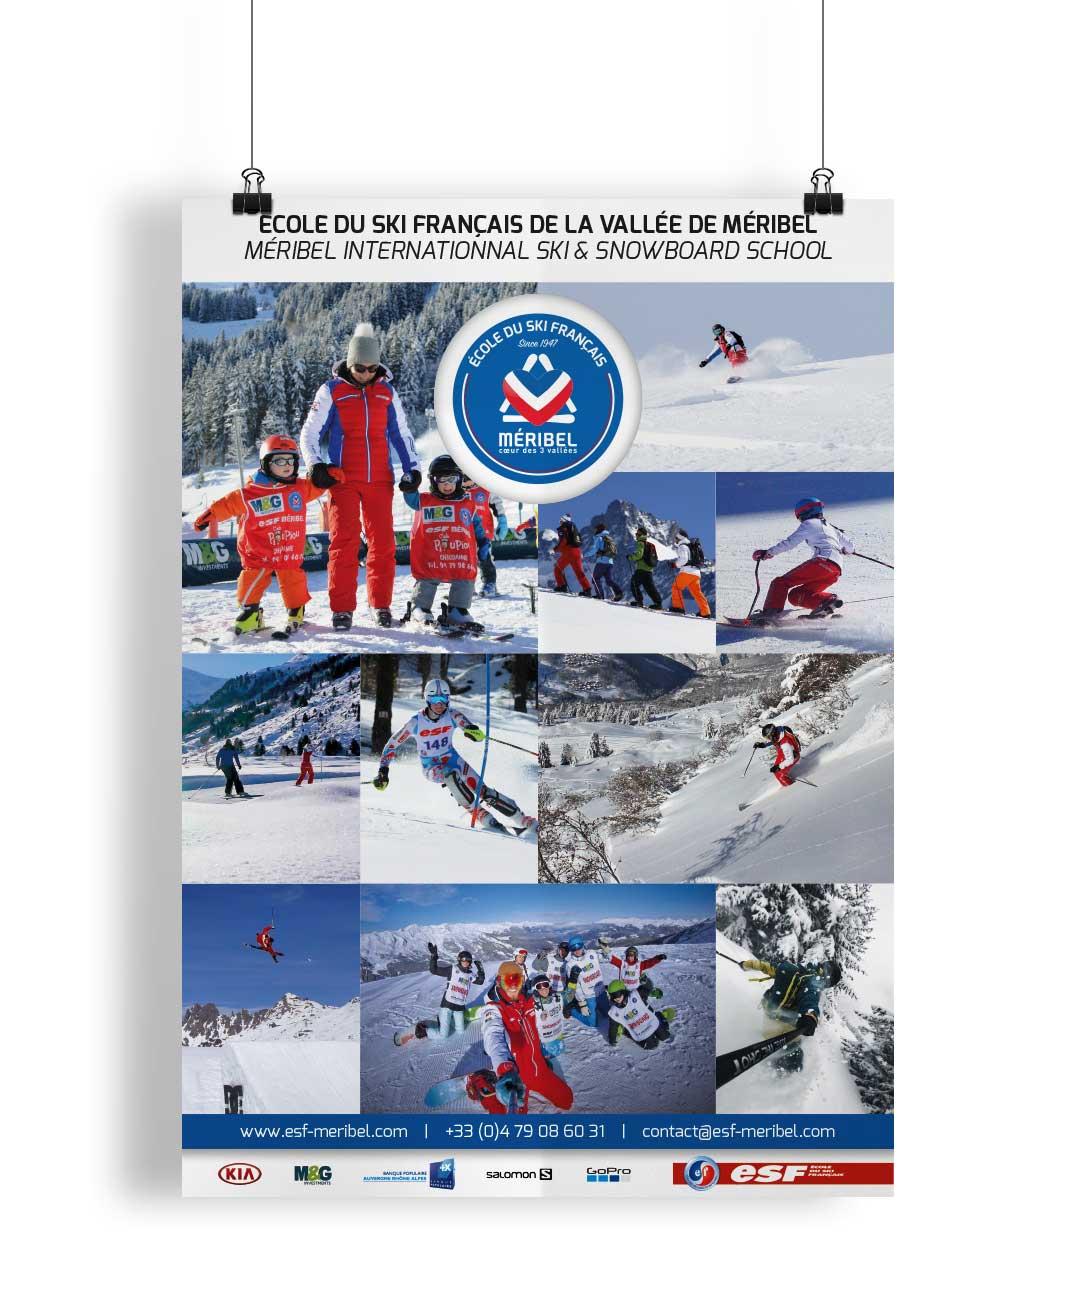 portfolio-esf-meribel-affiche-2-florence-borrel-flobo-design-graphique-infographie-webdesign-savoie-tarentaise-meribel-menuires-courchevel